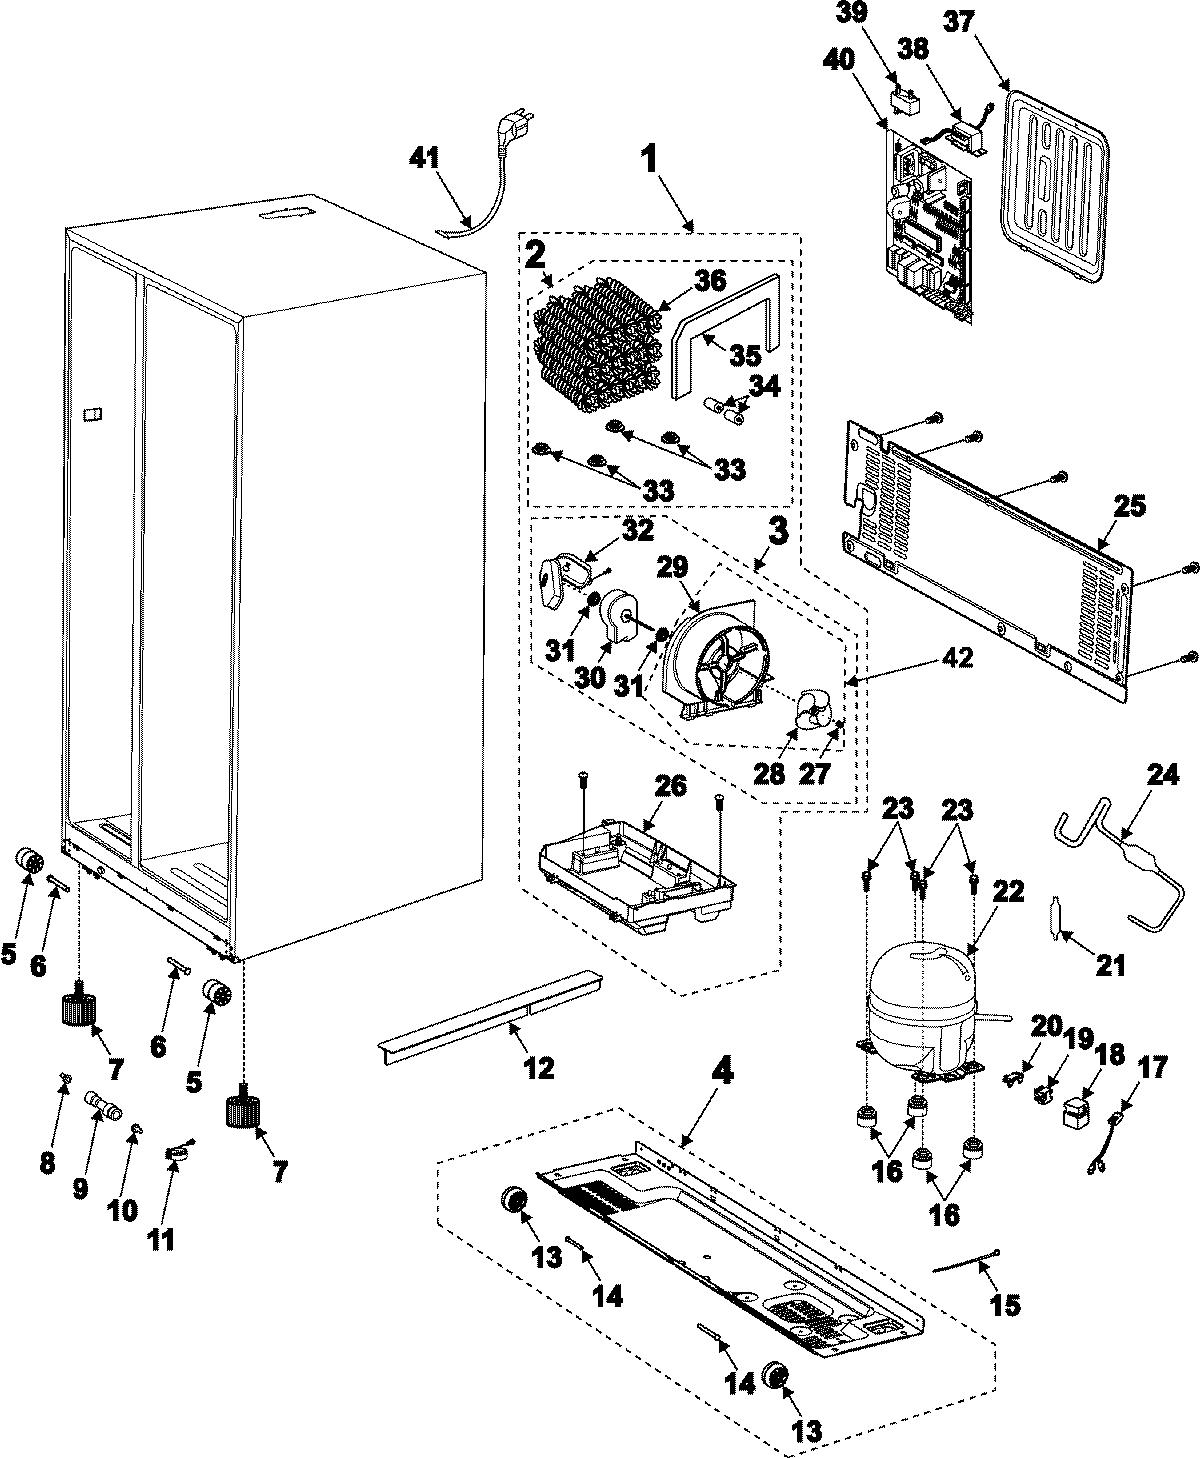 Led Electronics Usa Rs2630sh 09 Machine Compartment